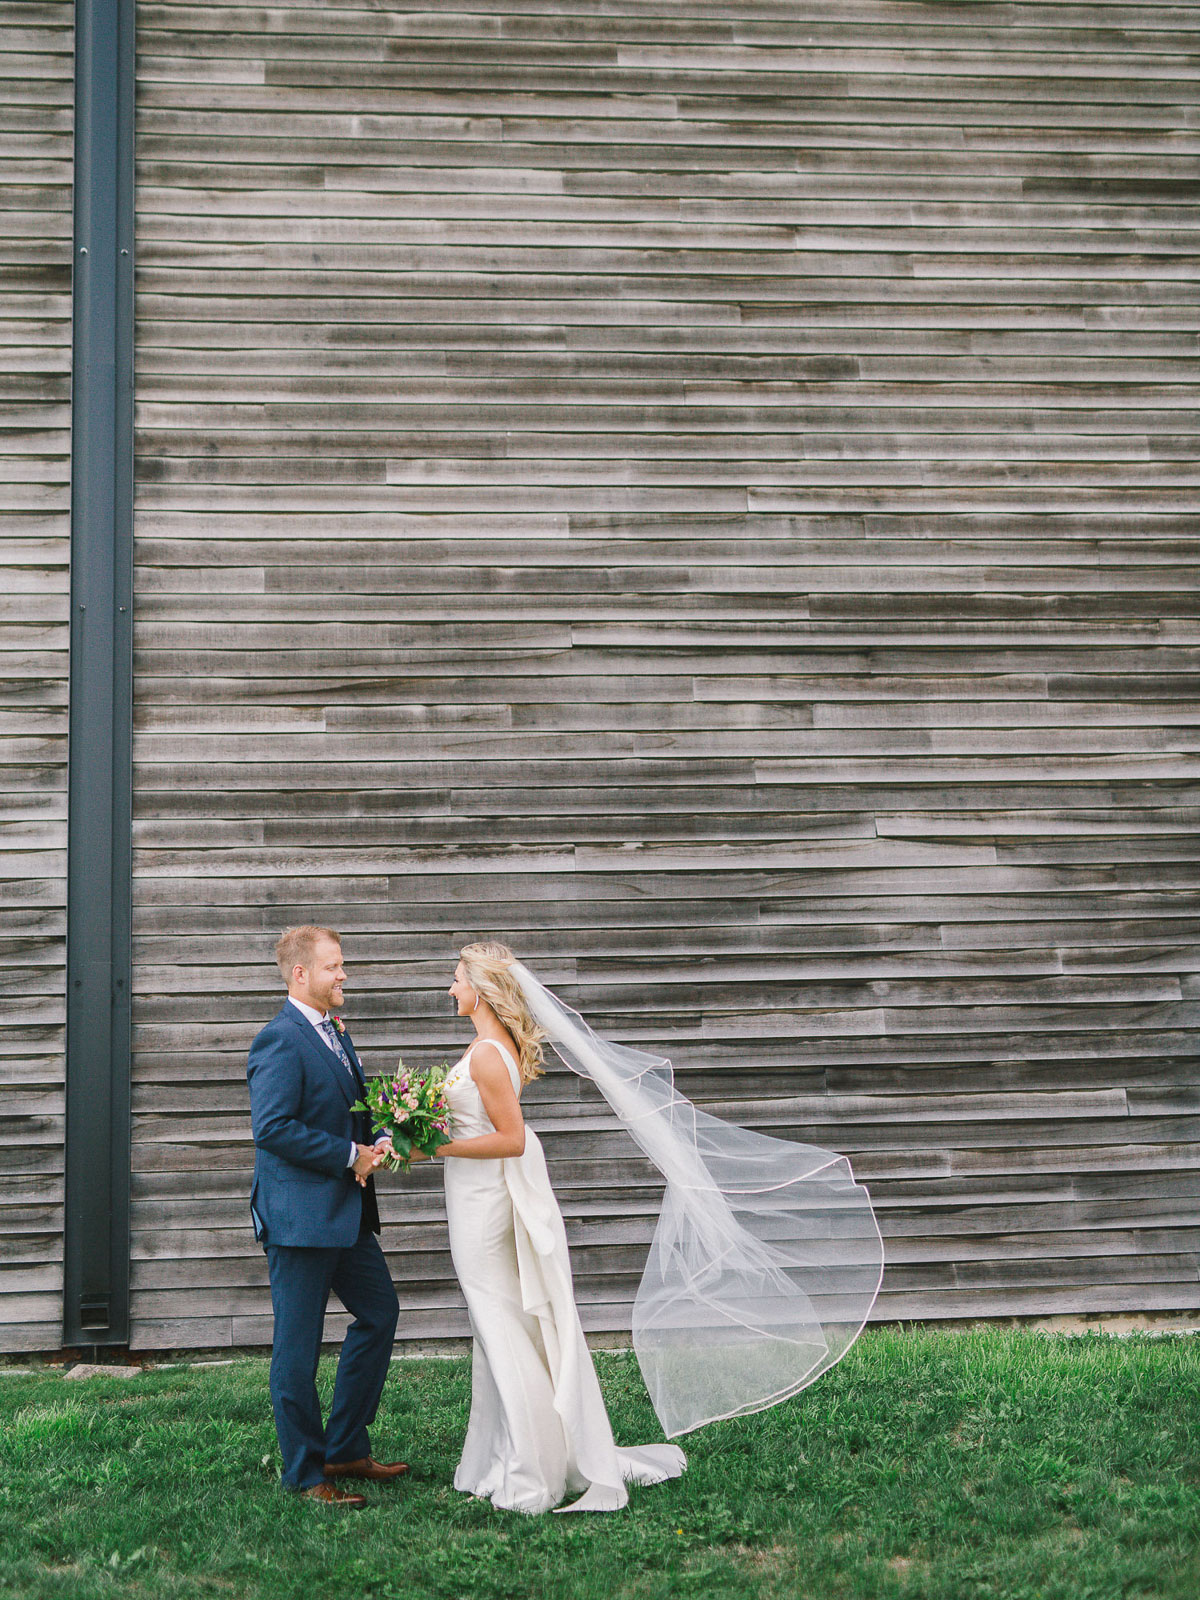 julia-park-photography-vineyard-bride-swish-list-stratus-winery-niagara-on-the-lake-wedding-5.jpg